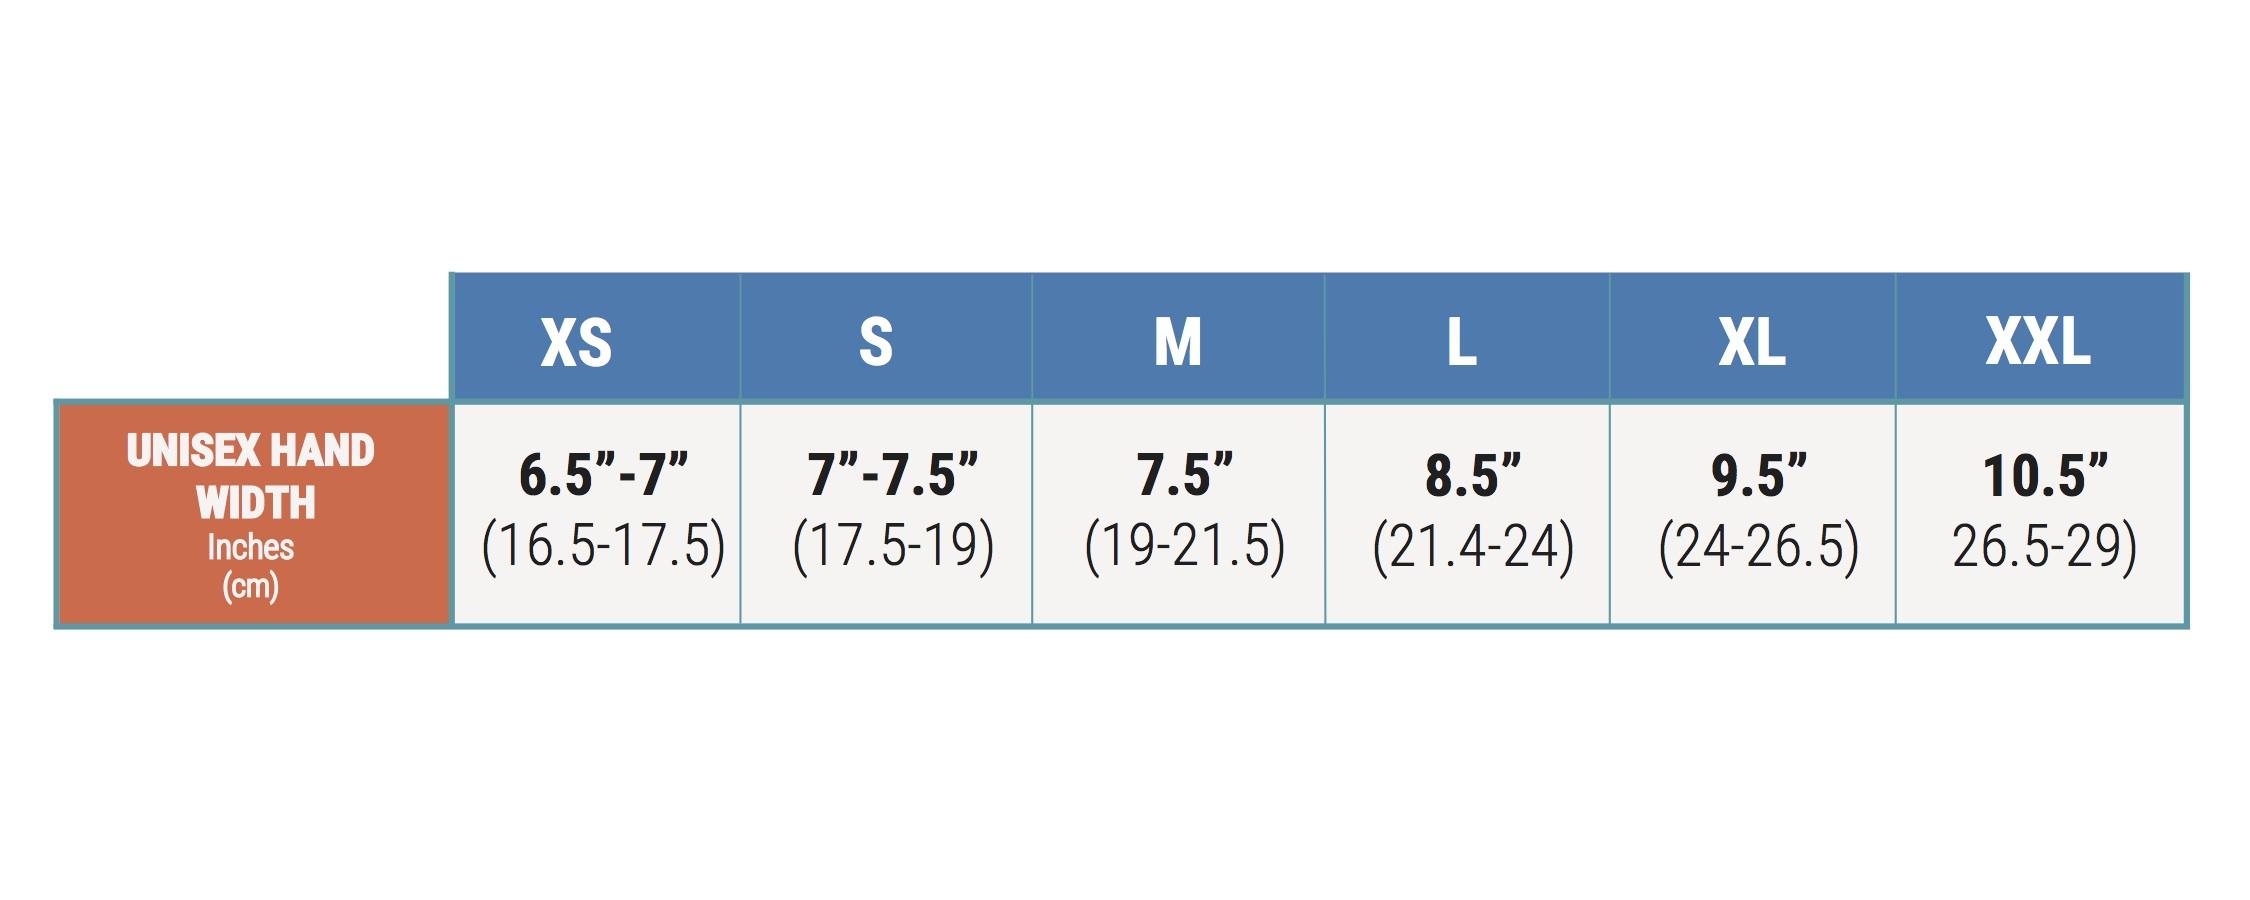 fwg-gill-glove-sizing-chart.jpg